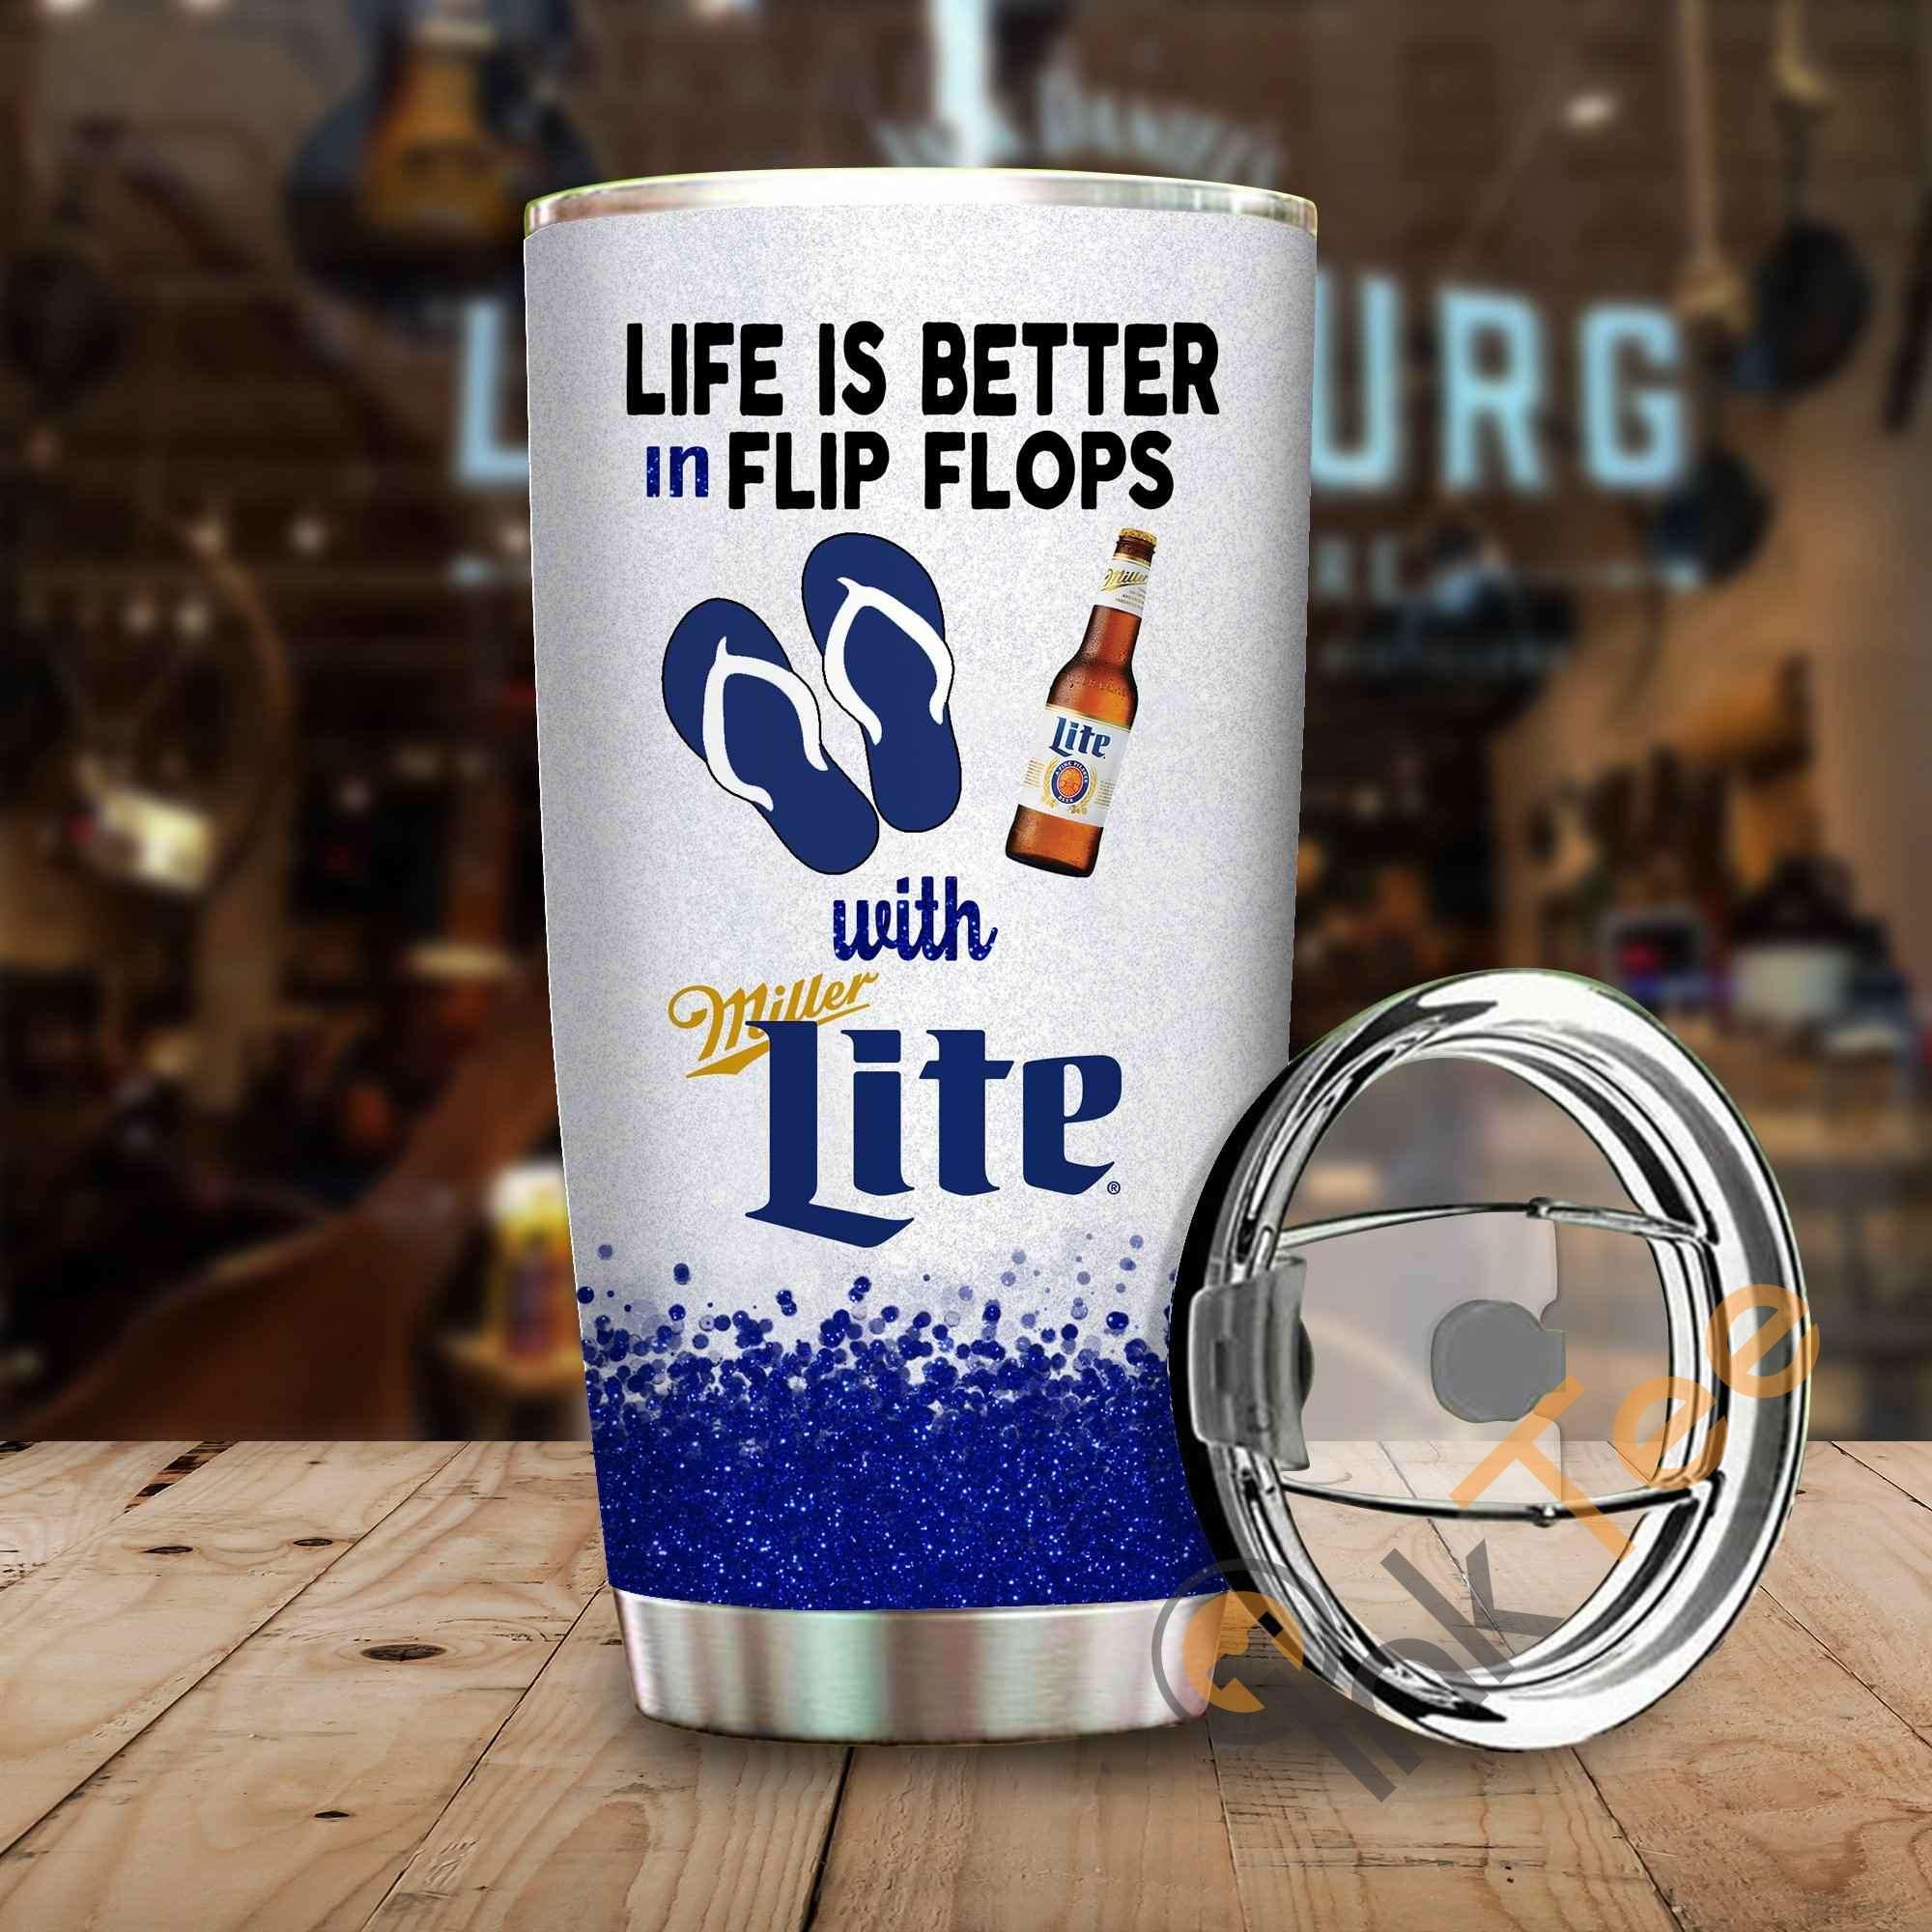 Life Is Better In Flip Flops With Miller Lite Amazon Best Seller Sku 4018 Stainless Steel Tumbler